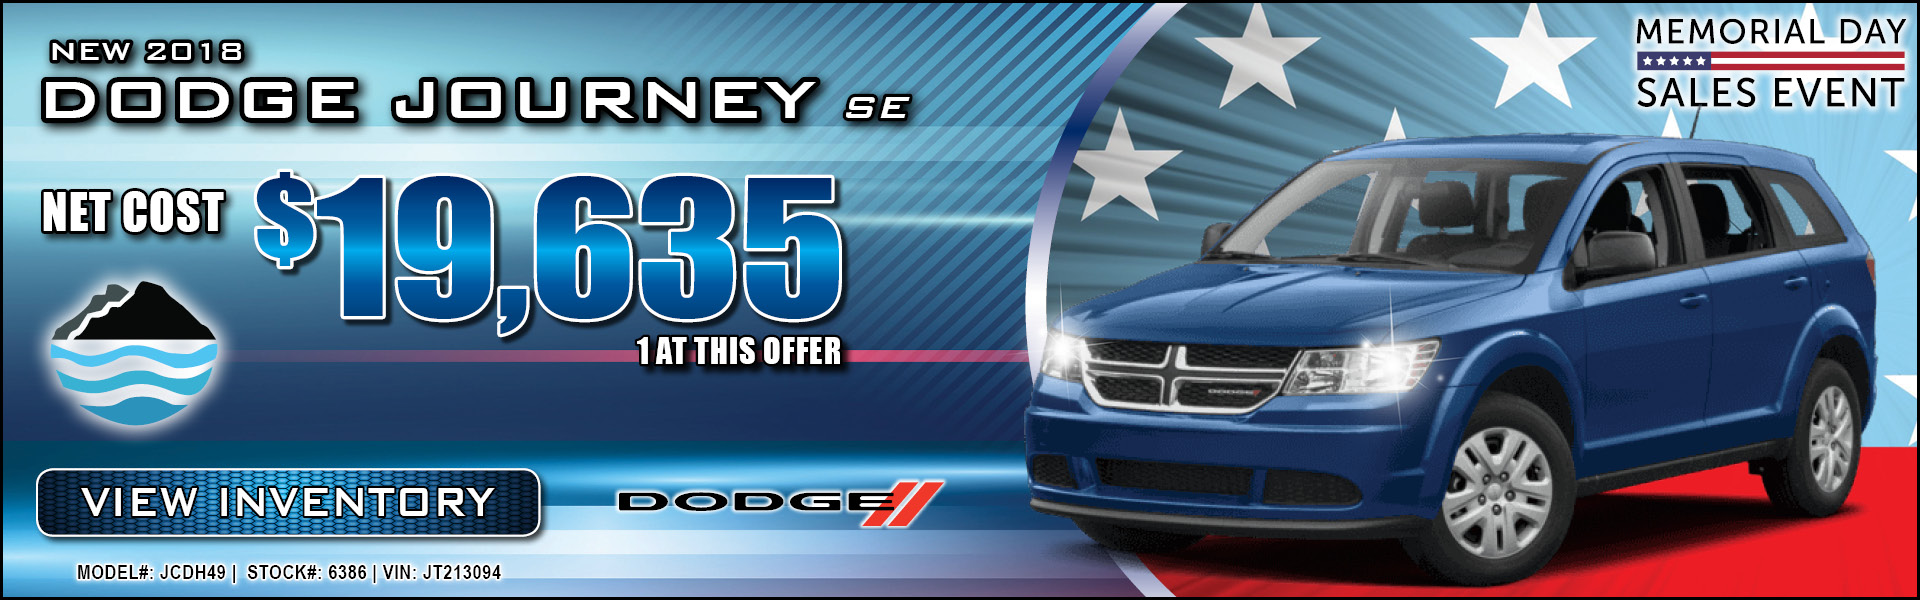 Dodge Journey $19,635